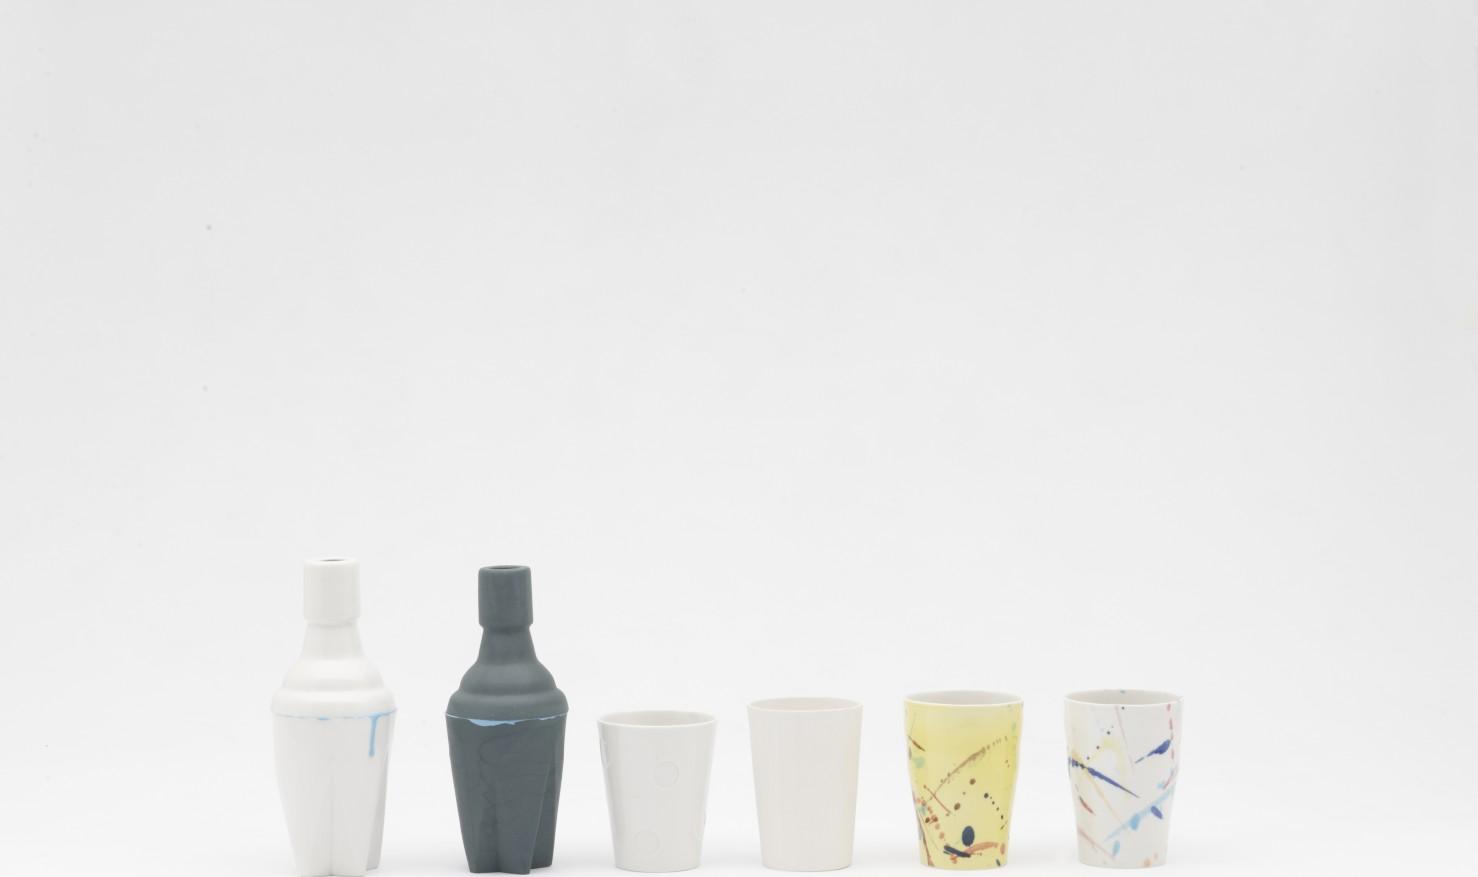 Stitch and Glue / Carnival / dots / Lemonade by Sander Luske / サンダー ルスケ